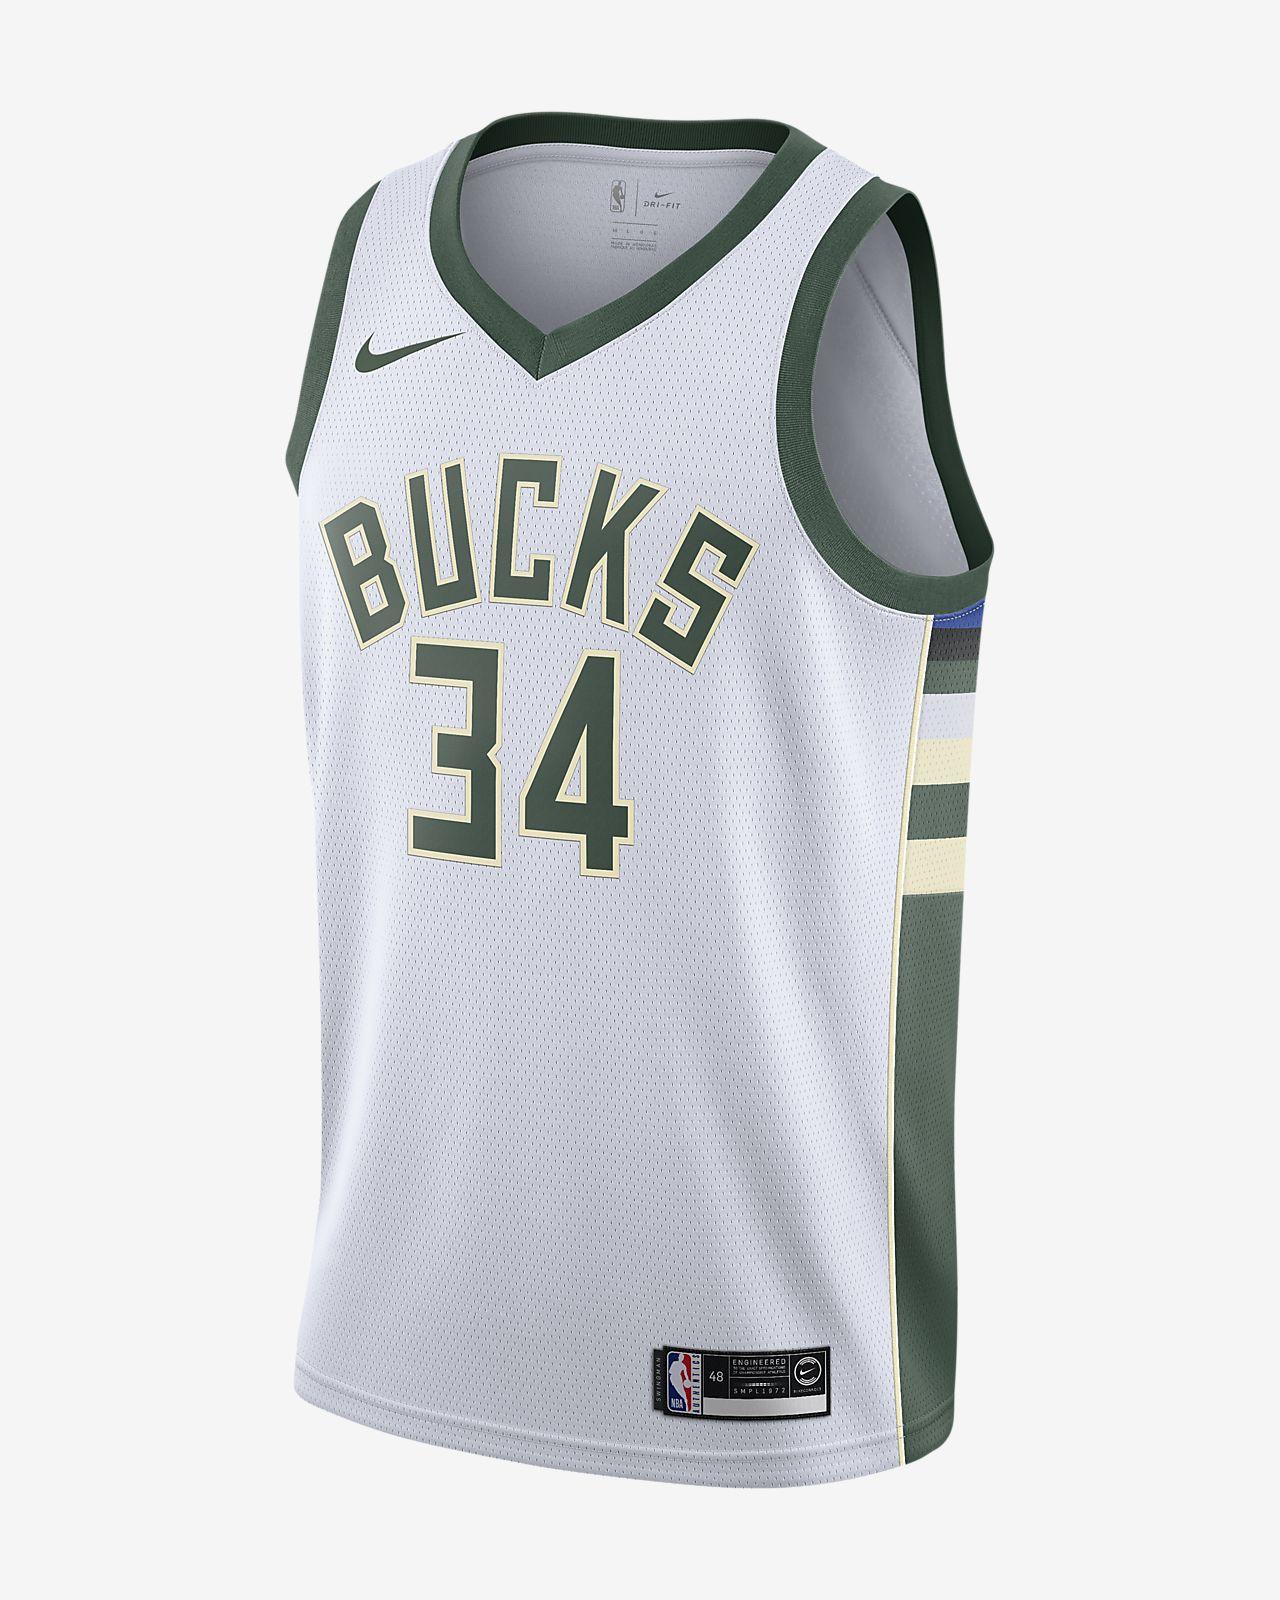 Dres Nike NBA Swingman Giannis Antetokounmpo Bucks Association Edition